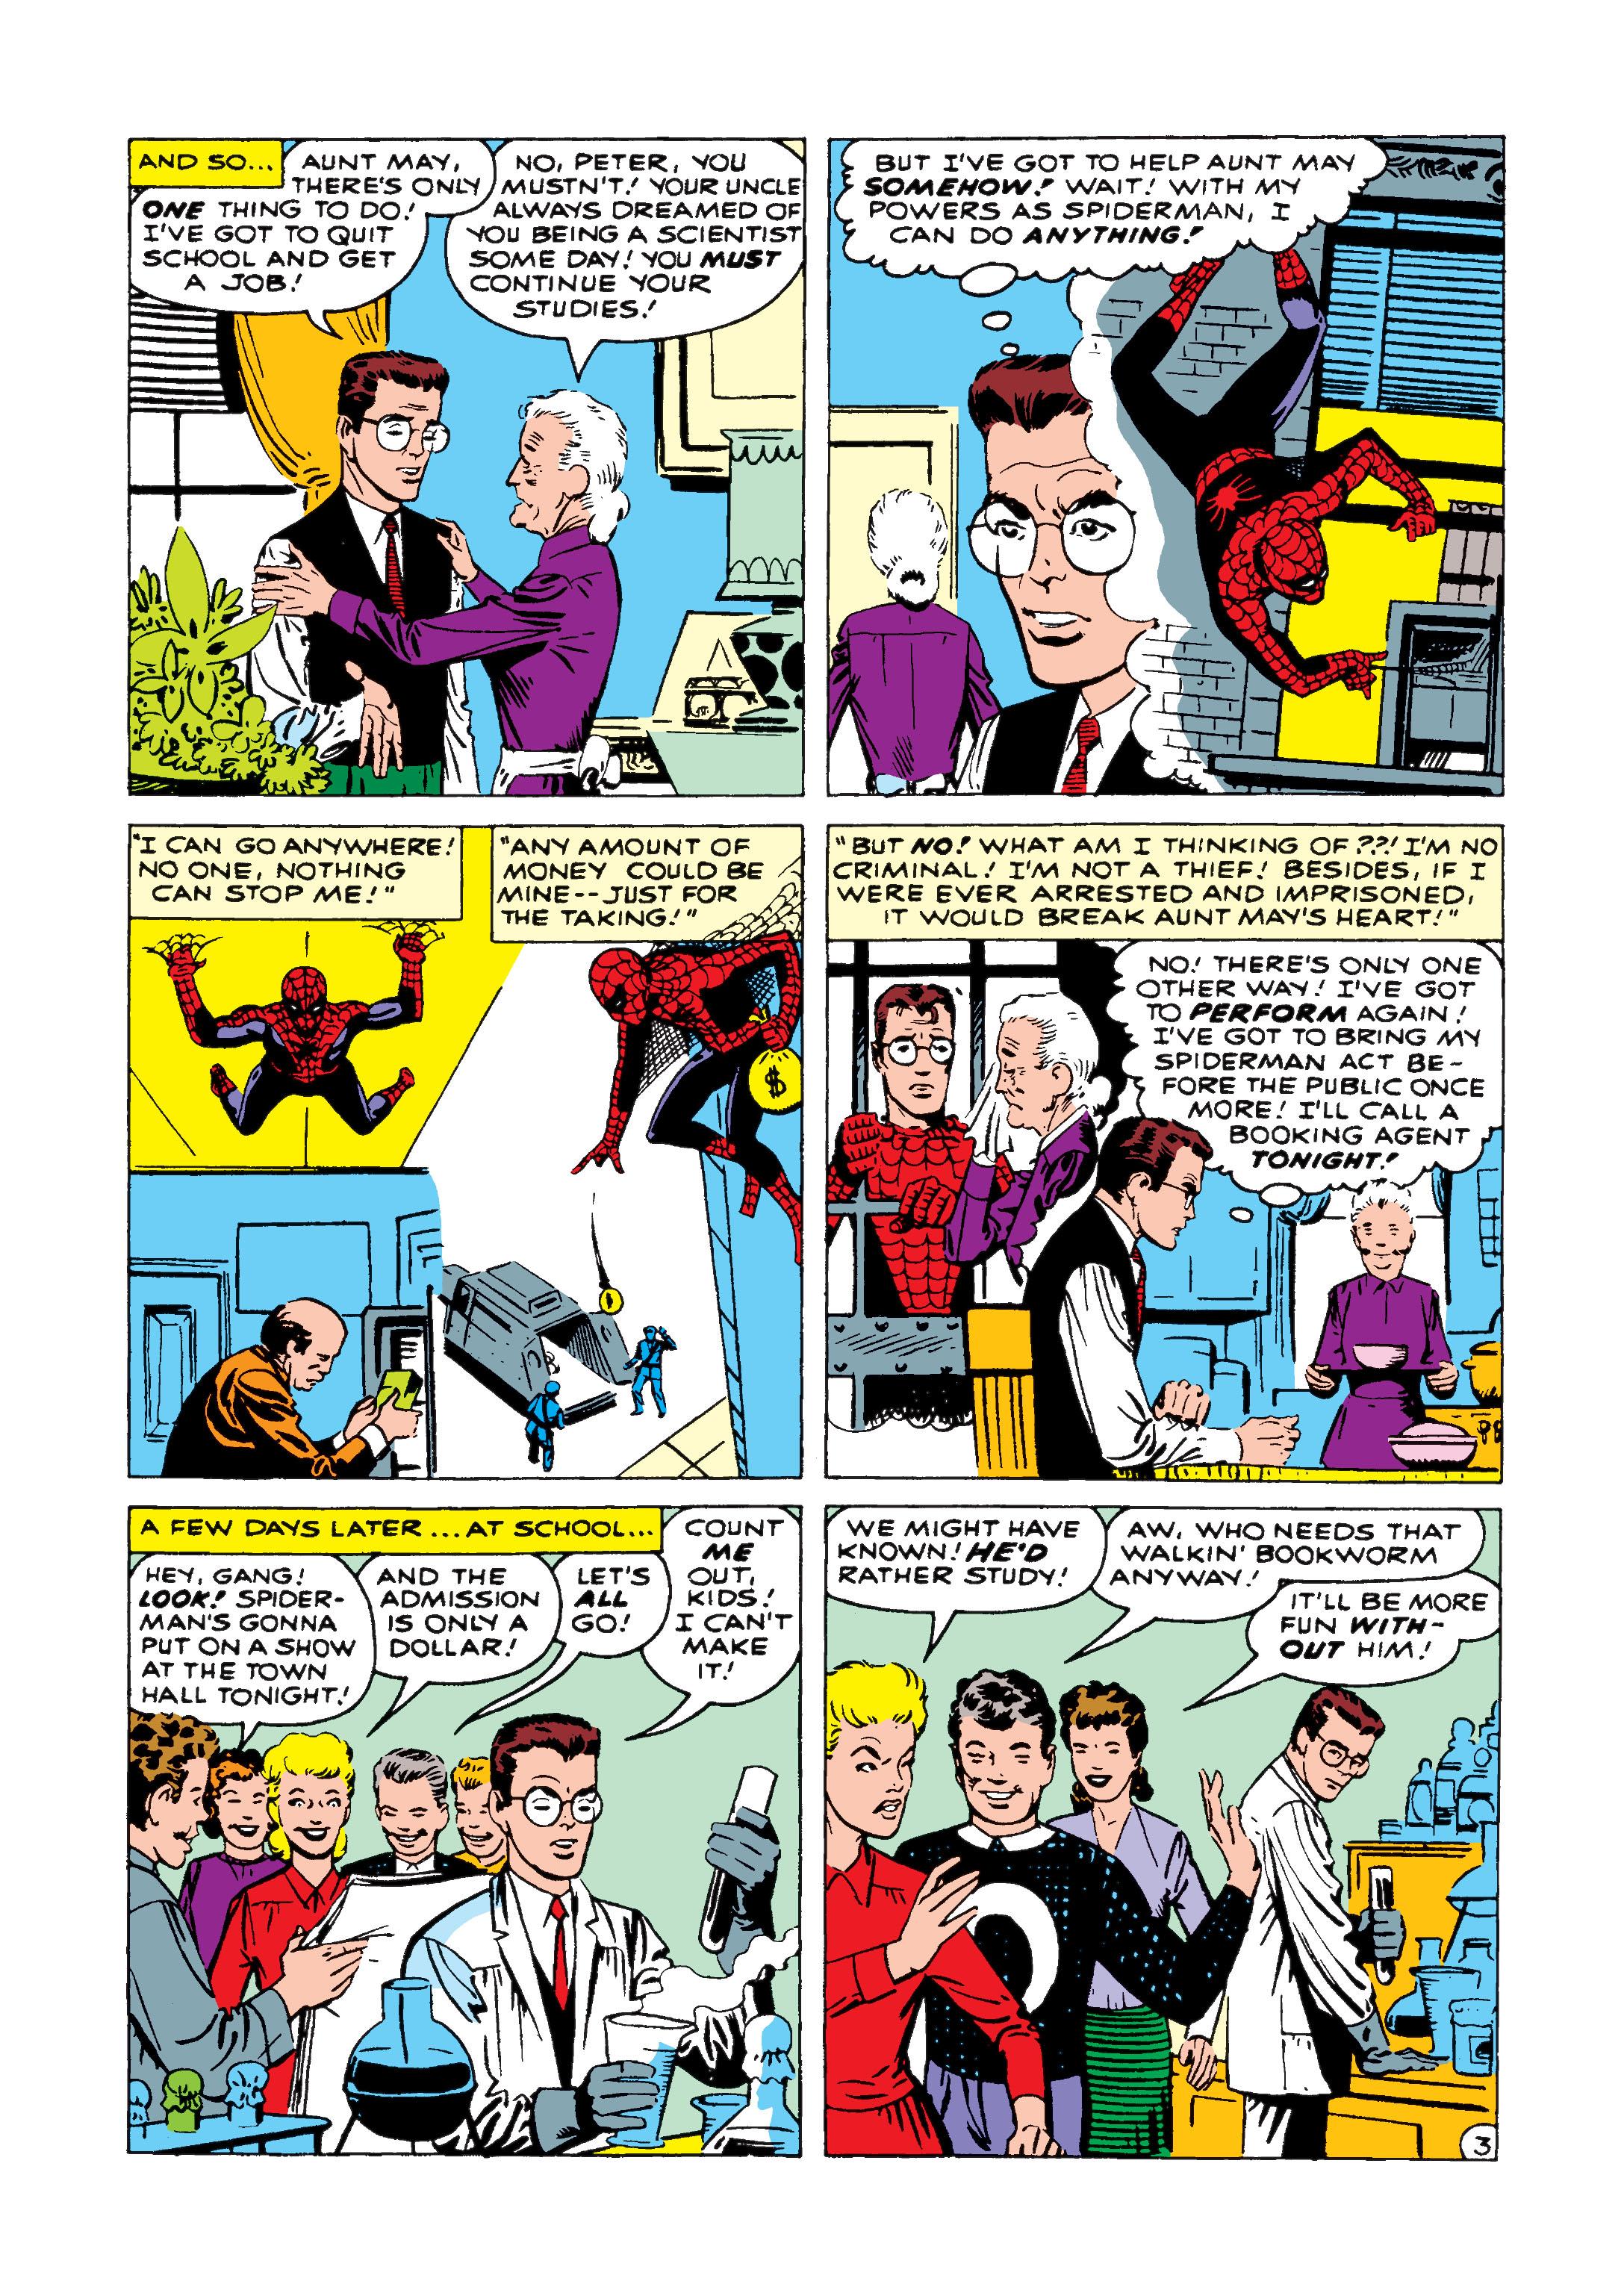 Spider-Man Character Study ― The Ultimate Essay F4RzpfYnjmVB-_rZKY_kXh8KDCBVrsRQIwgnVMJJbWCD-VtF0nn8sxYplSy3A94unJ7RFXqHAKch=s0